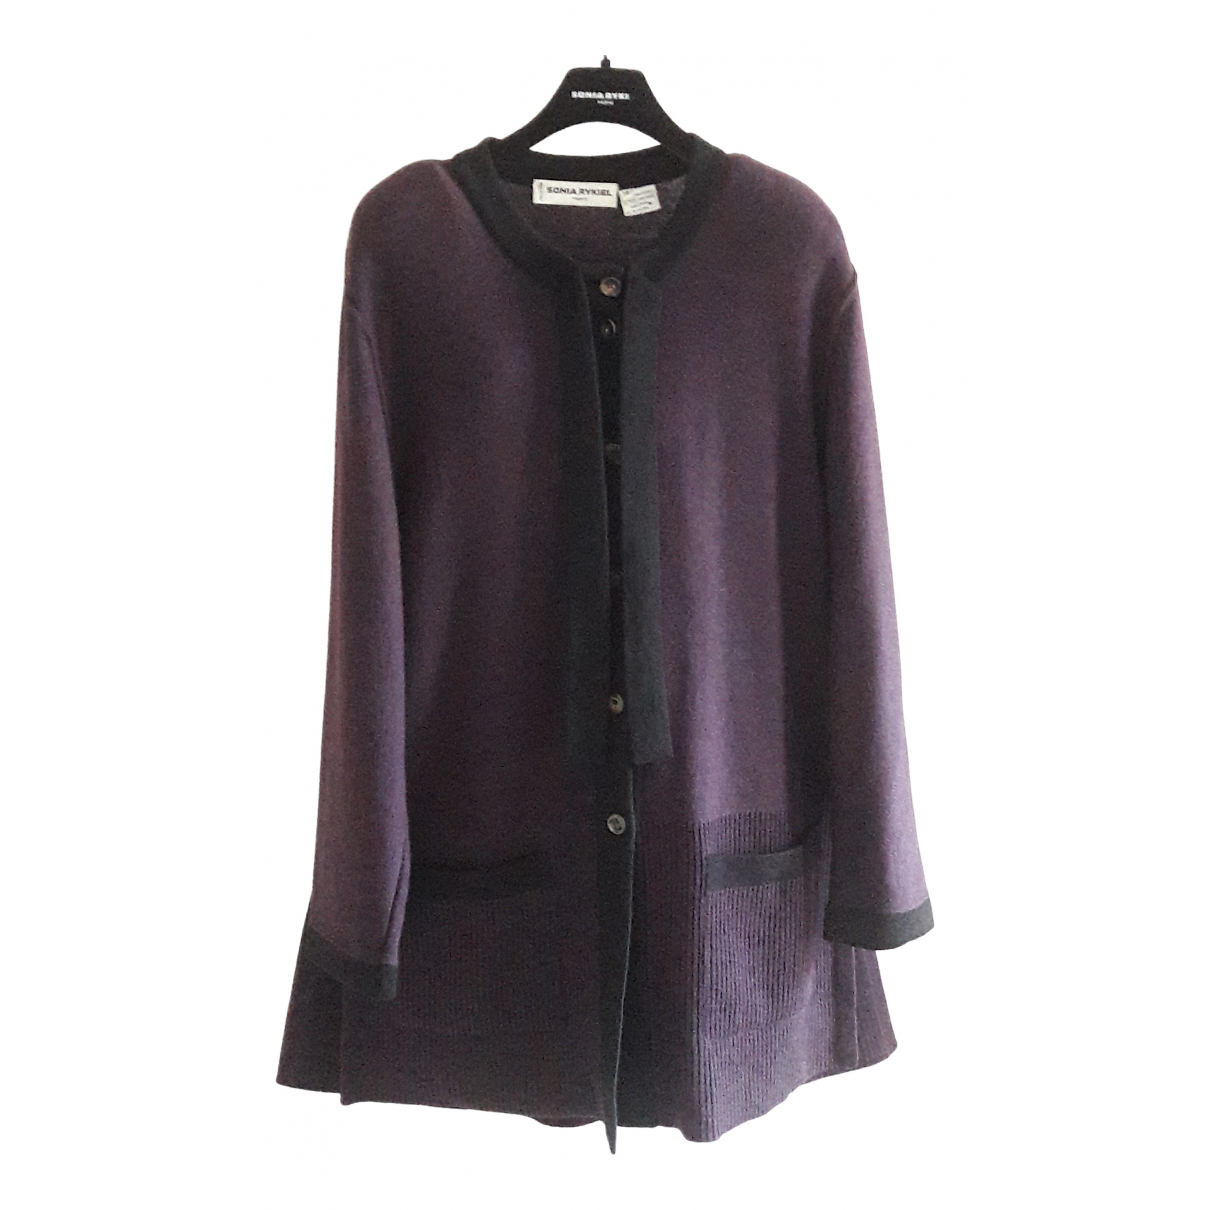 Sonia Rykiel \N Pullover in  Lila Wolle